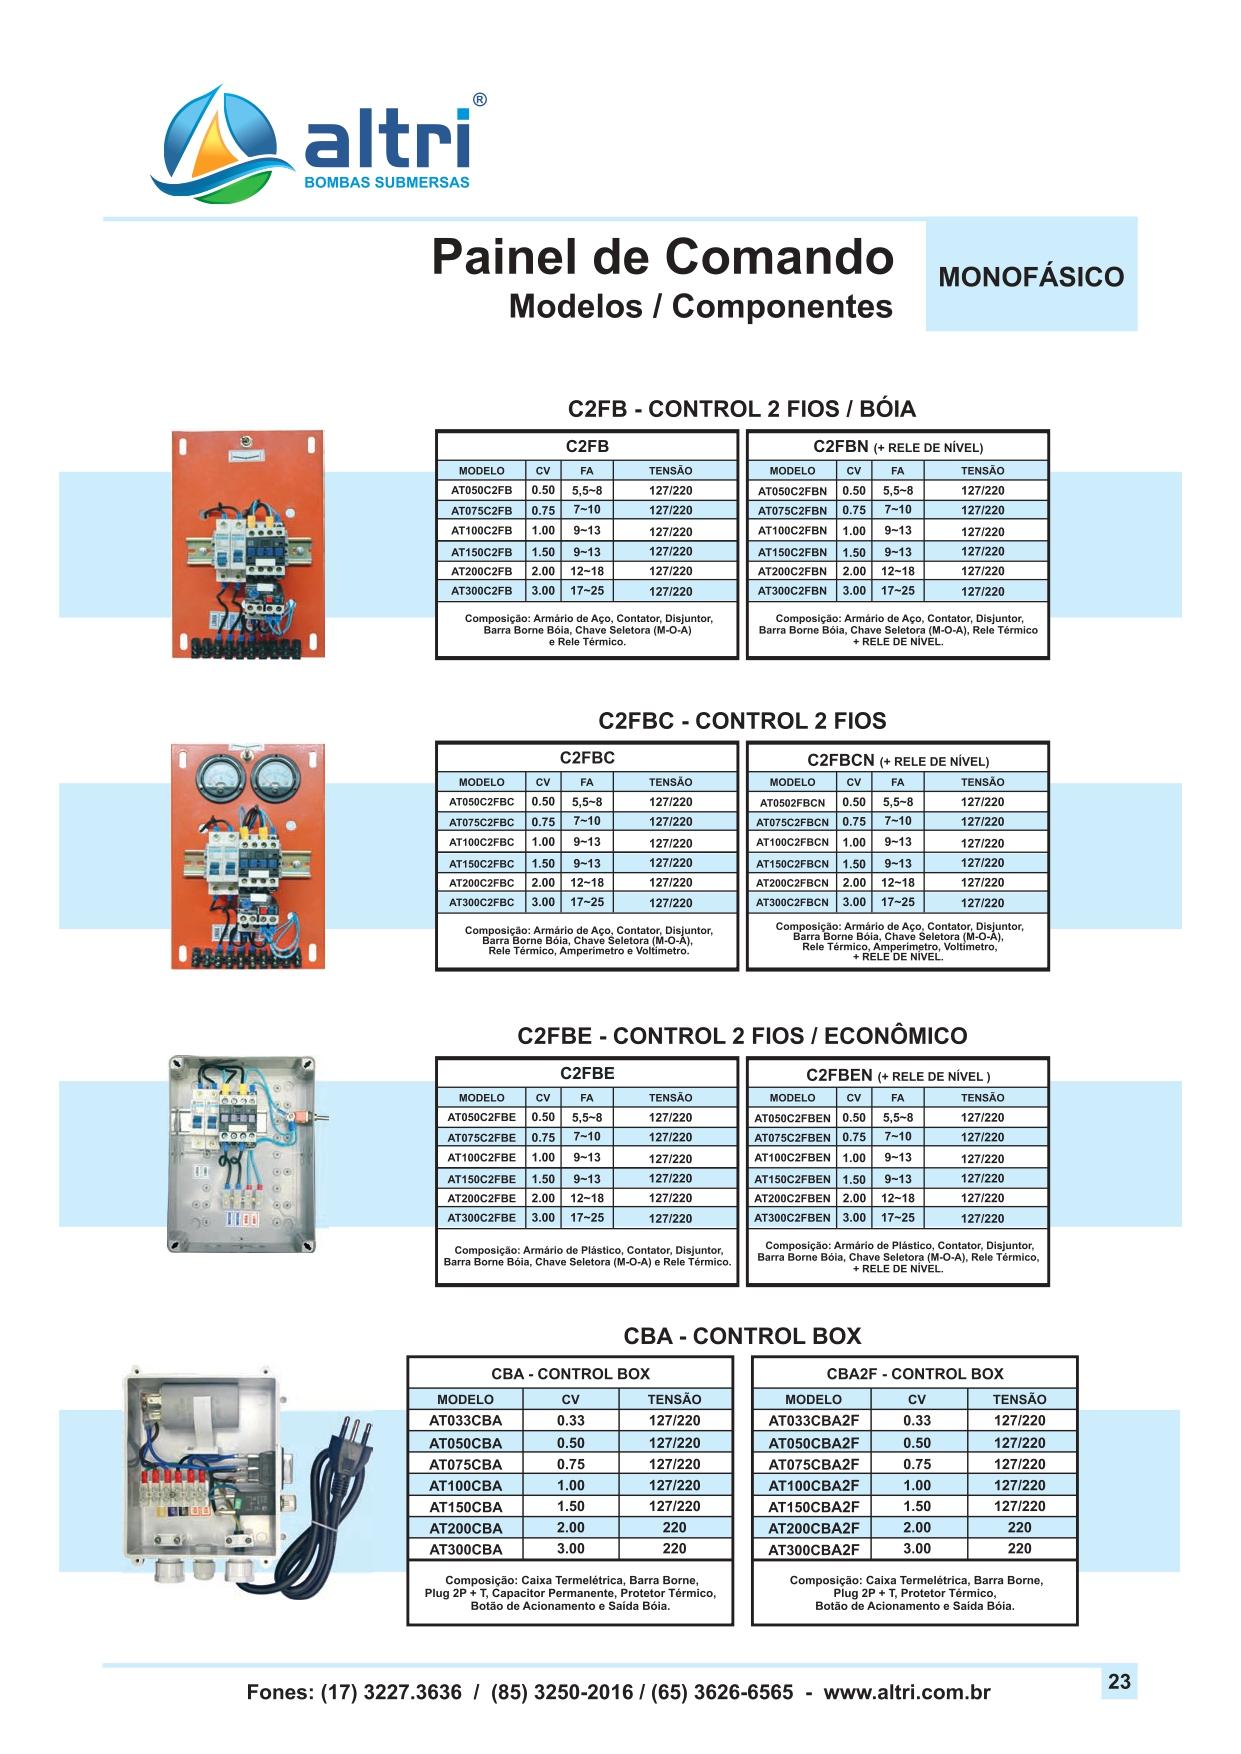 CATALOGO DE PRODUTOS ALTRI 2021 - WEB_page-0025